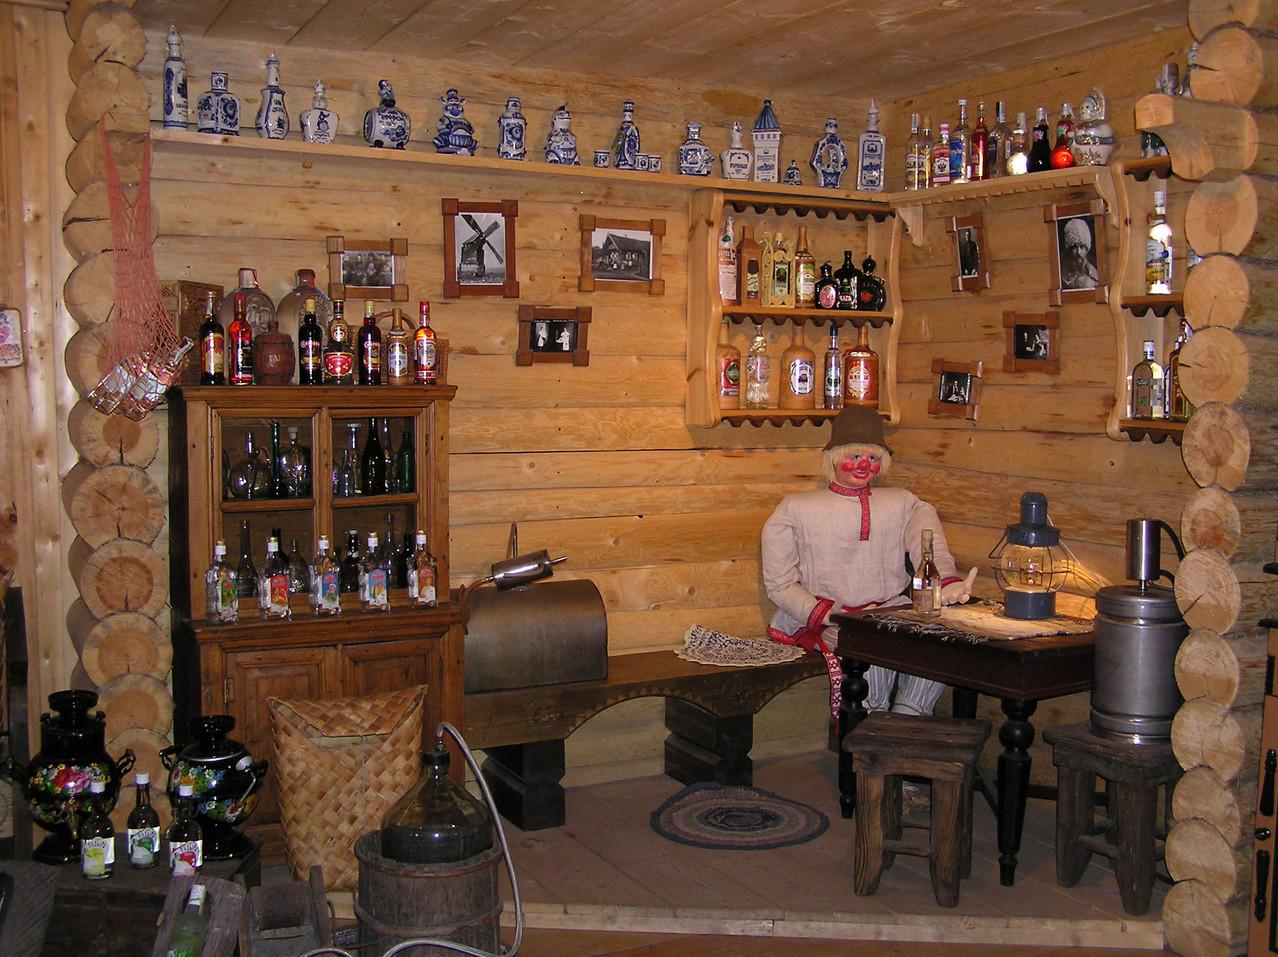 ... Wodkamuseum, ...